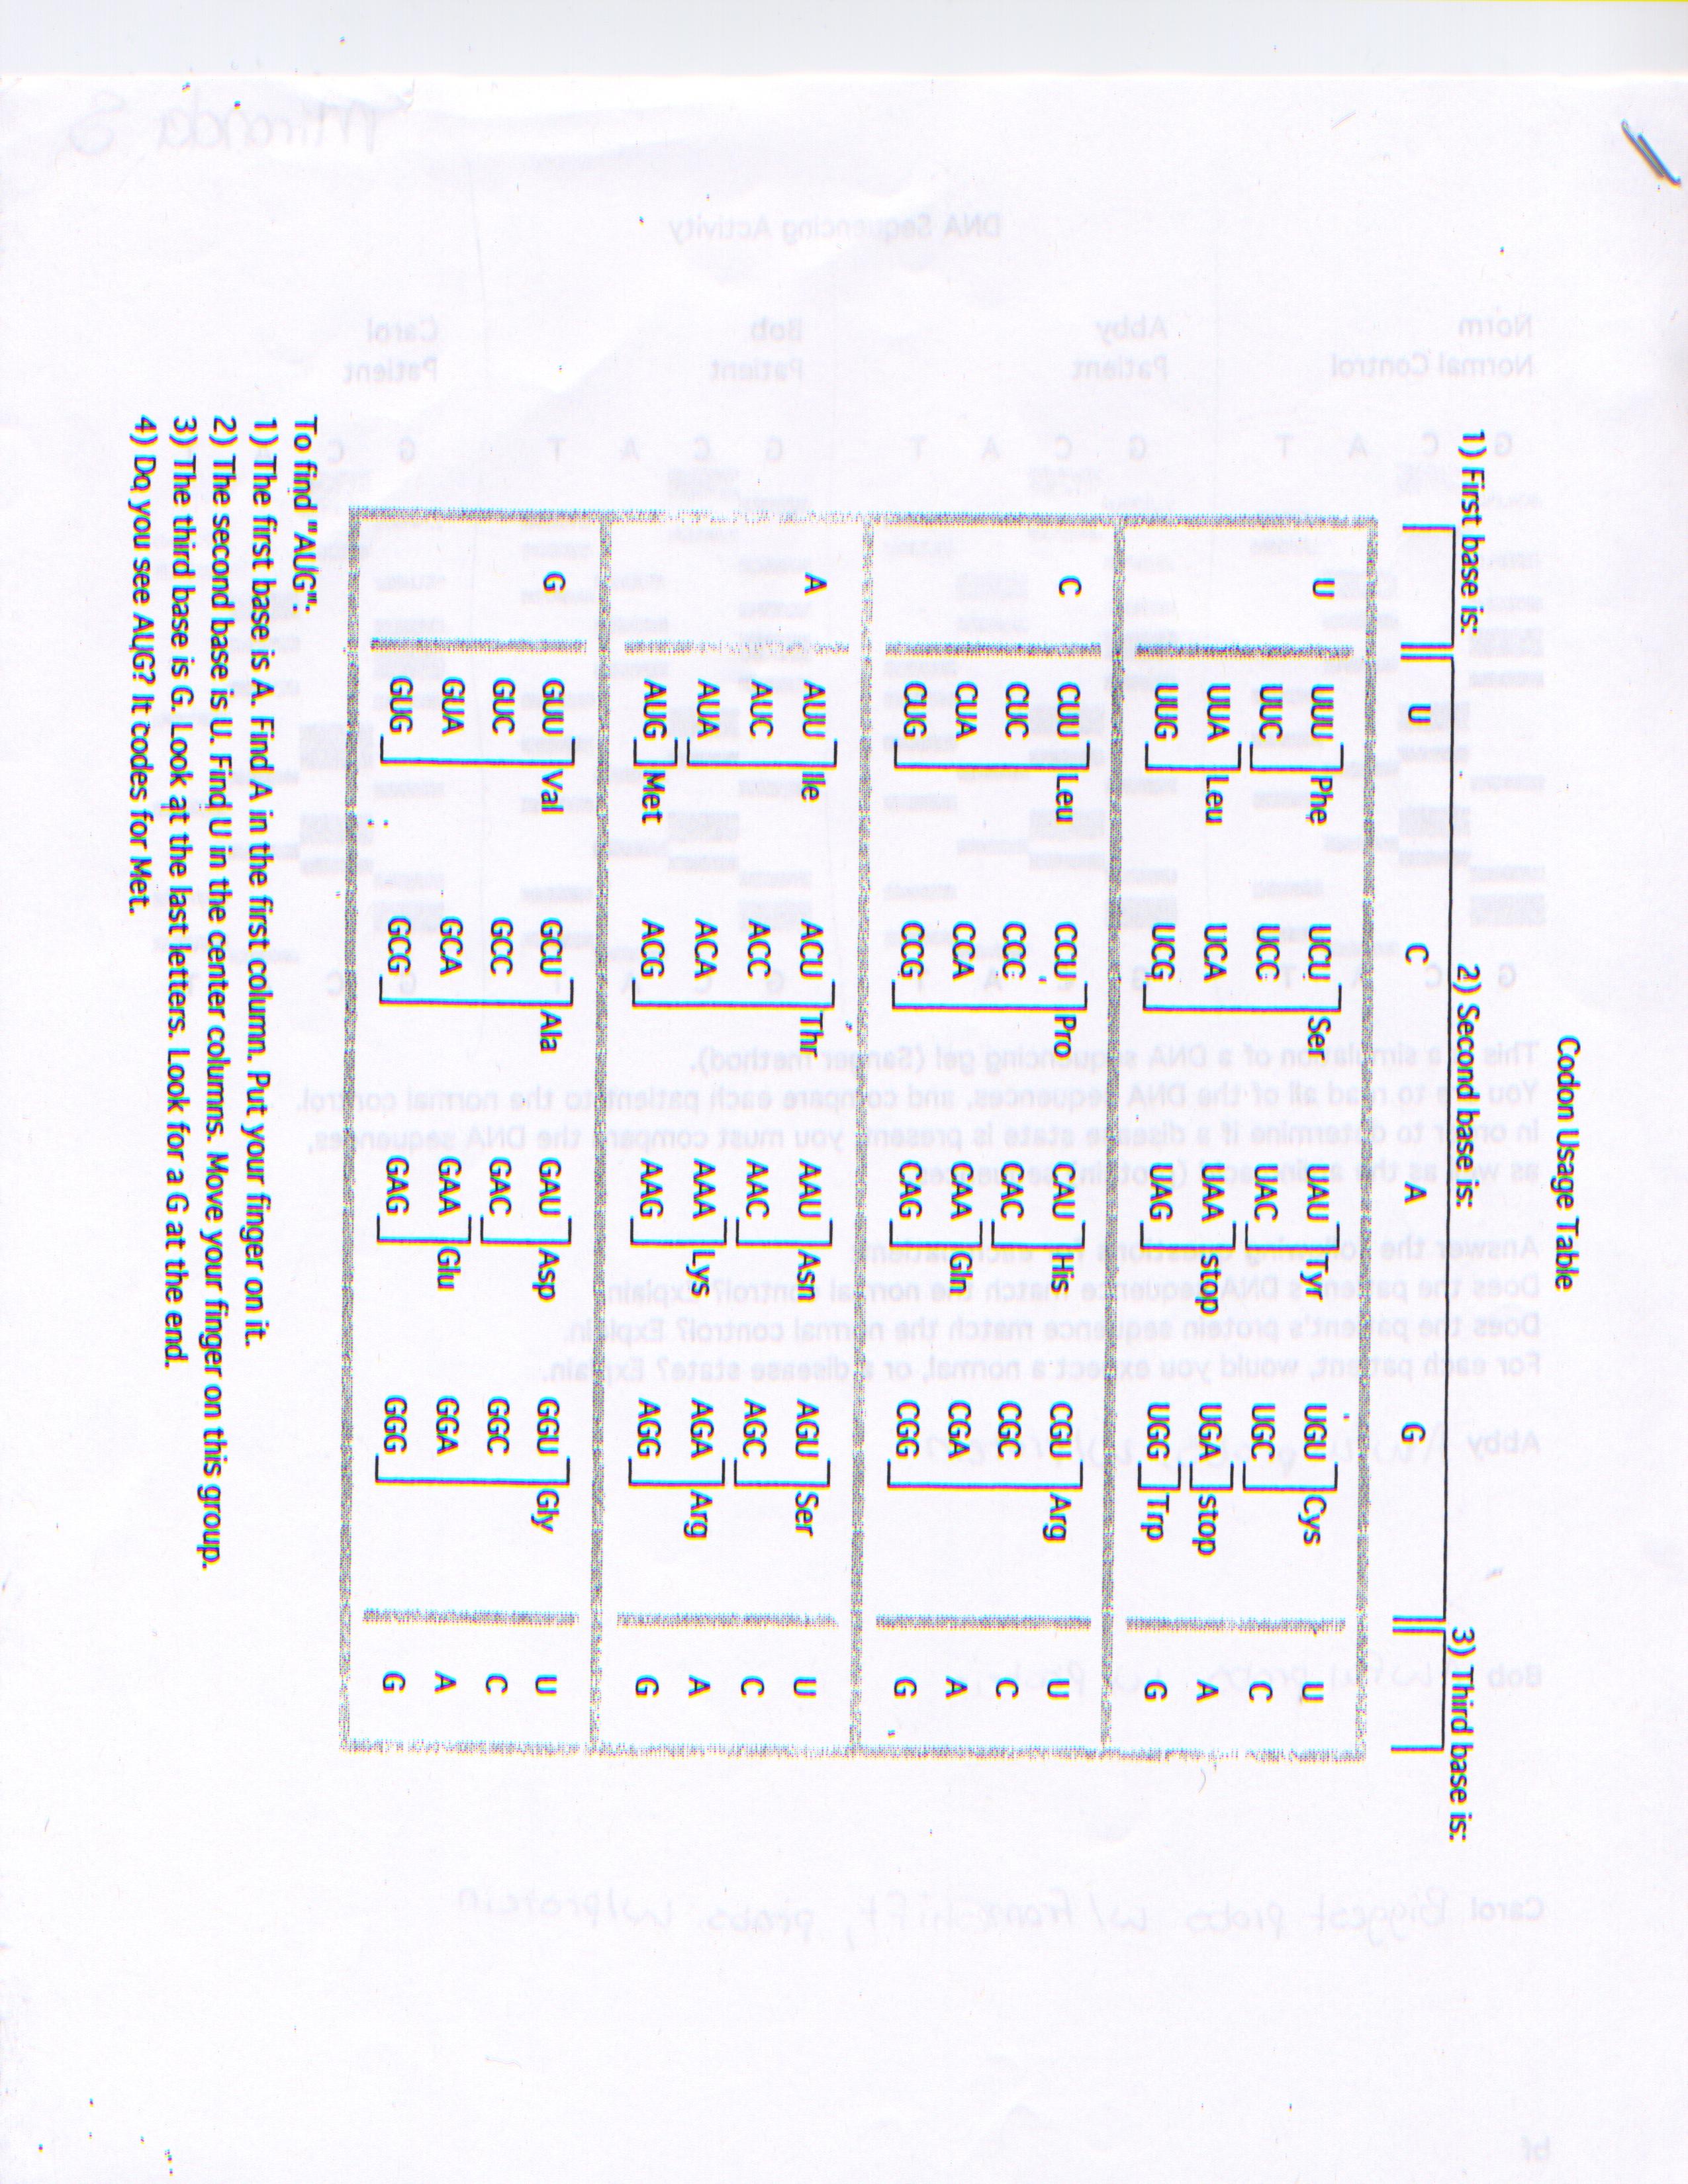 Old School Dna Sequencing Sanger Method